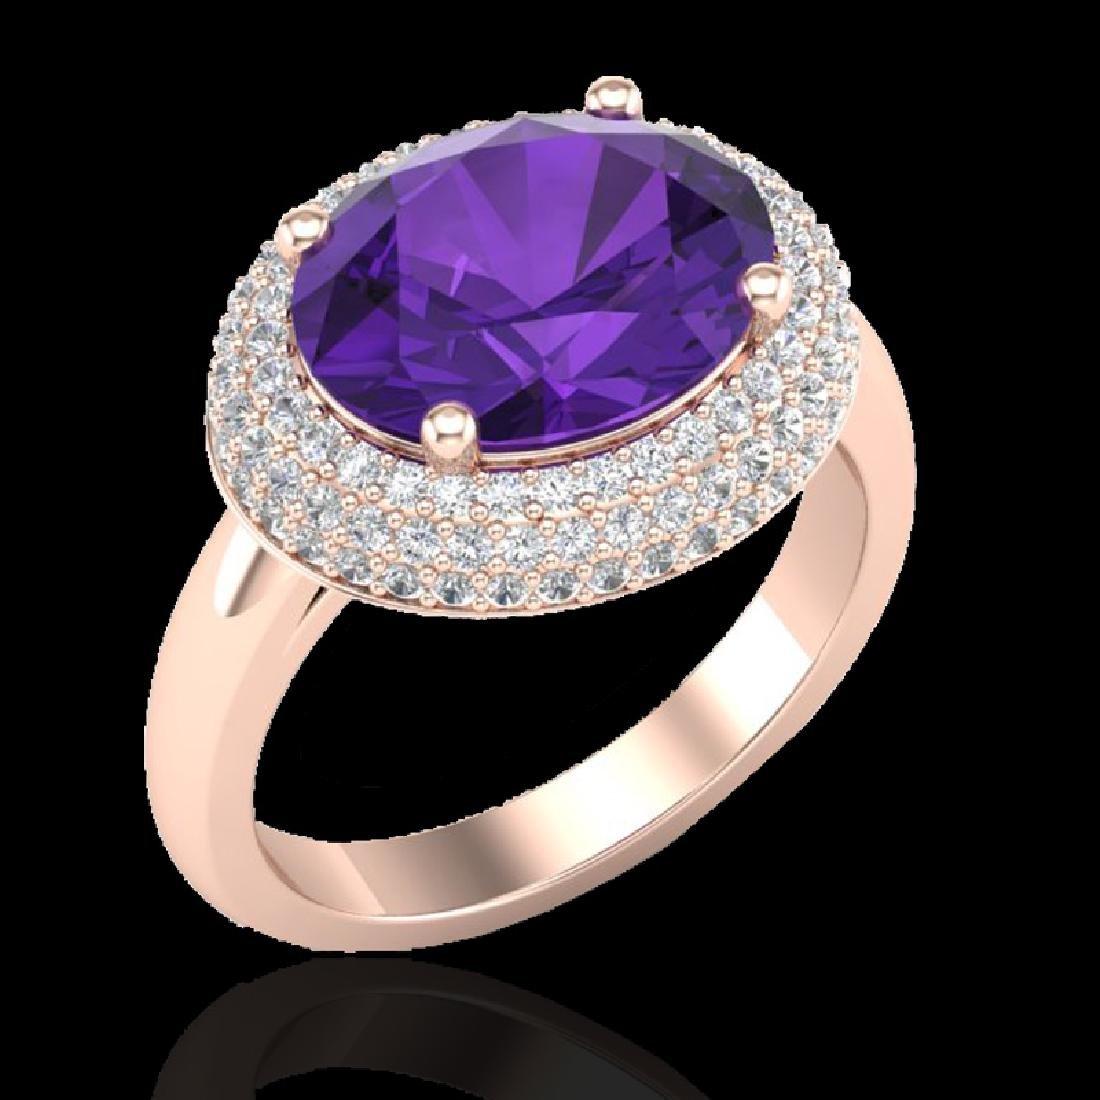 4 CTW Amethyst & Micro Pave VS/SI Diamond Ring 14K Rose